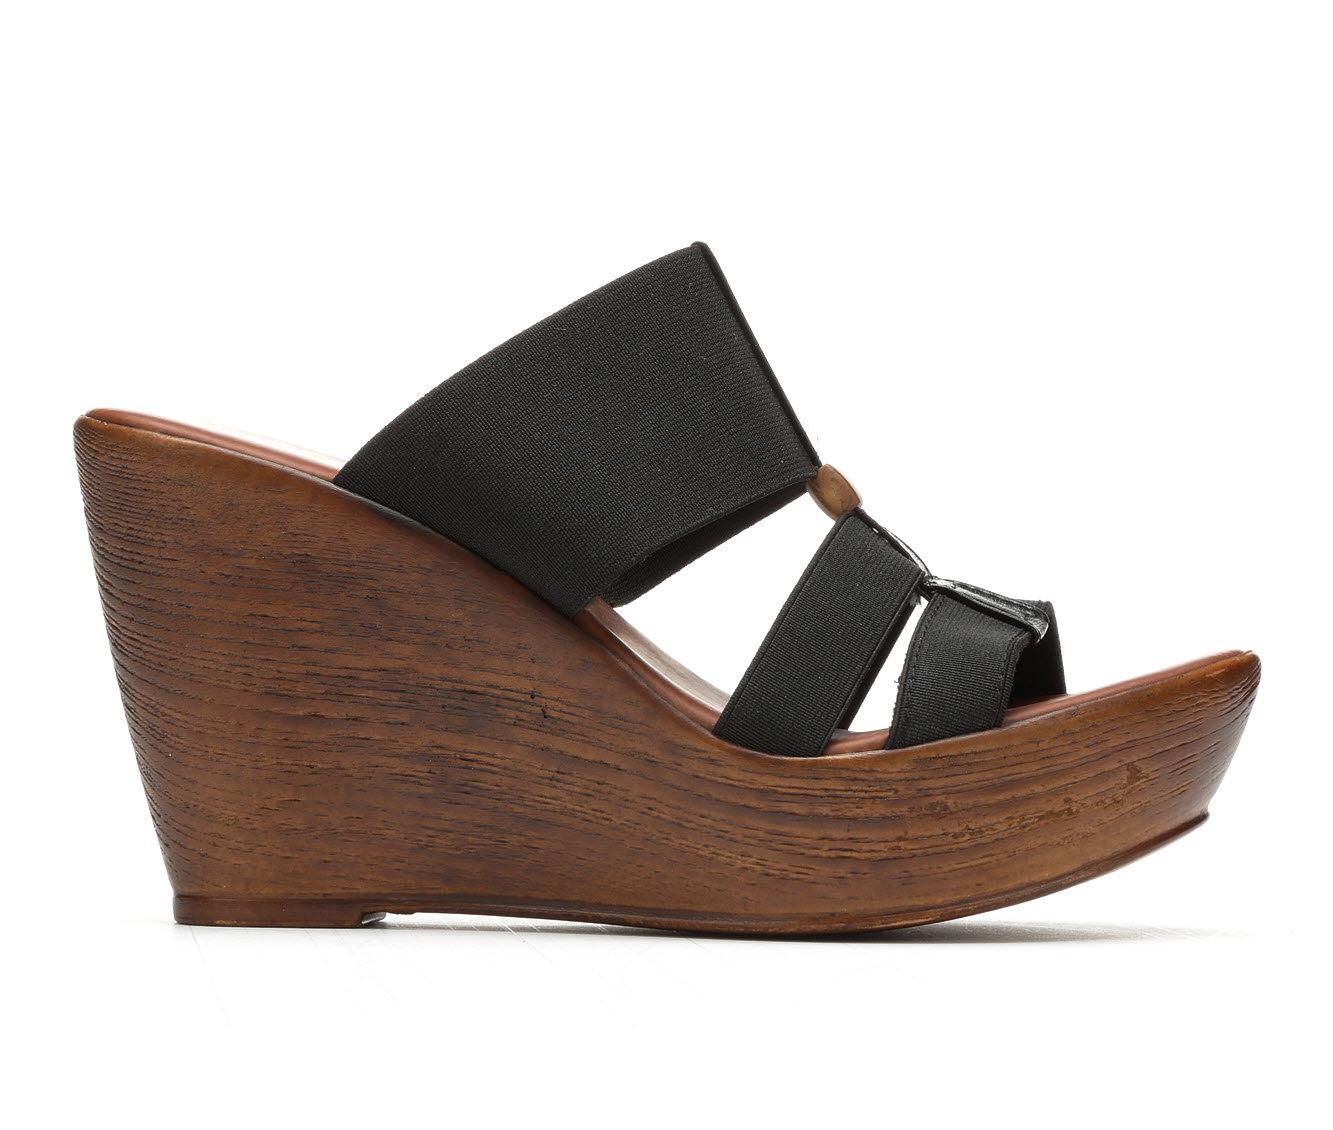 Women's Italian Shoemakers Stoy Sandals (Black)